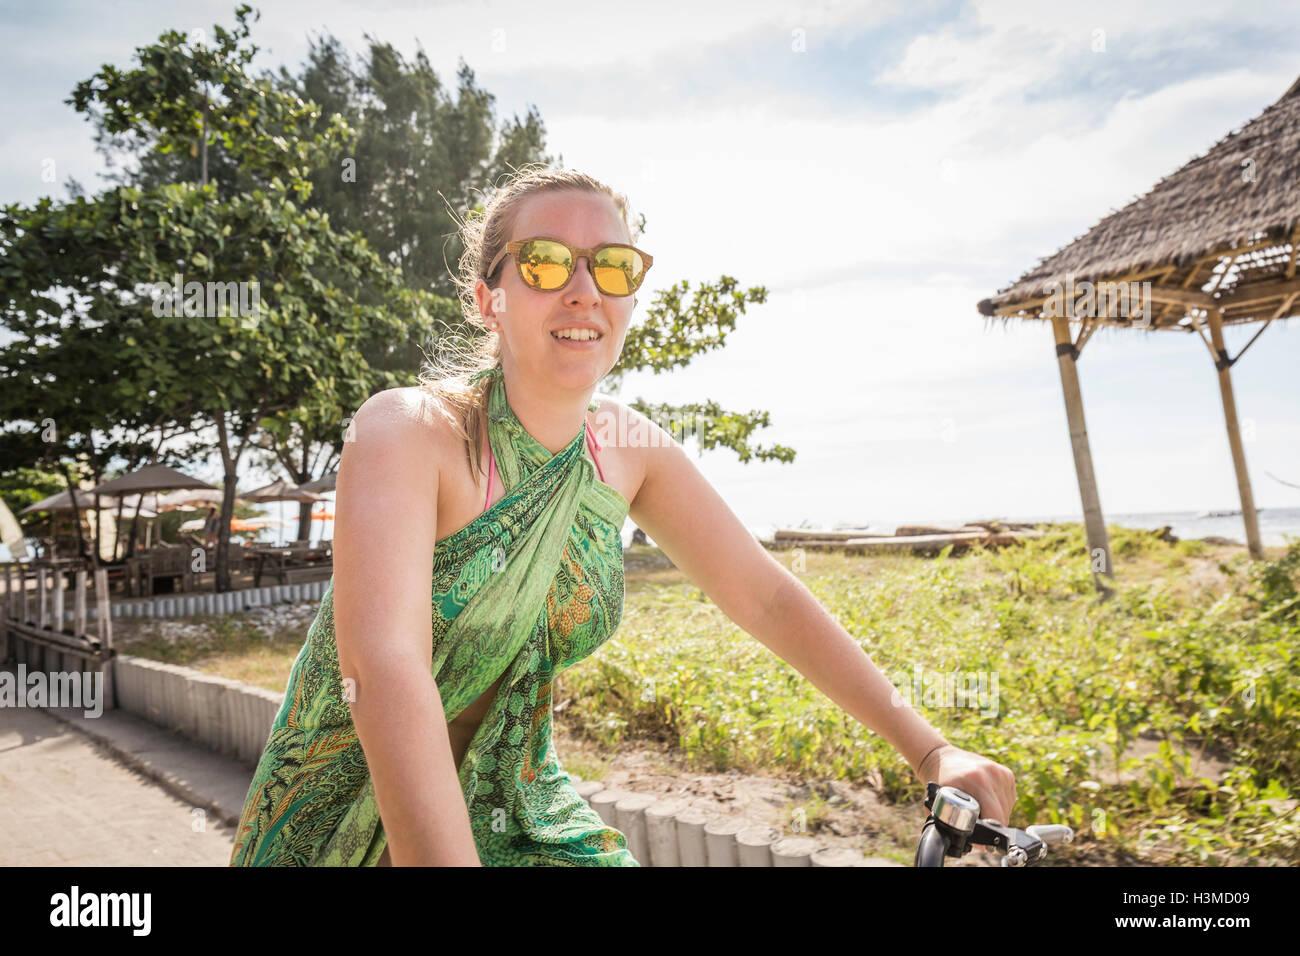 Woman cycling near coast, Gili Trawangan, Lombok, Indonesia - Stock Image